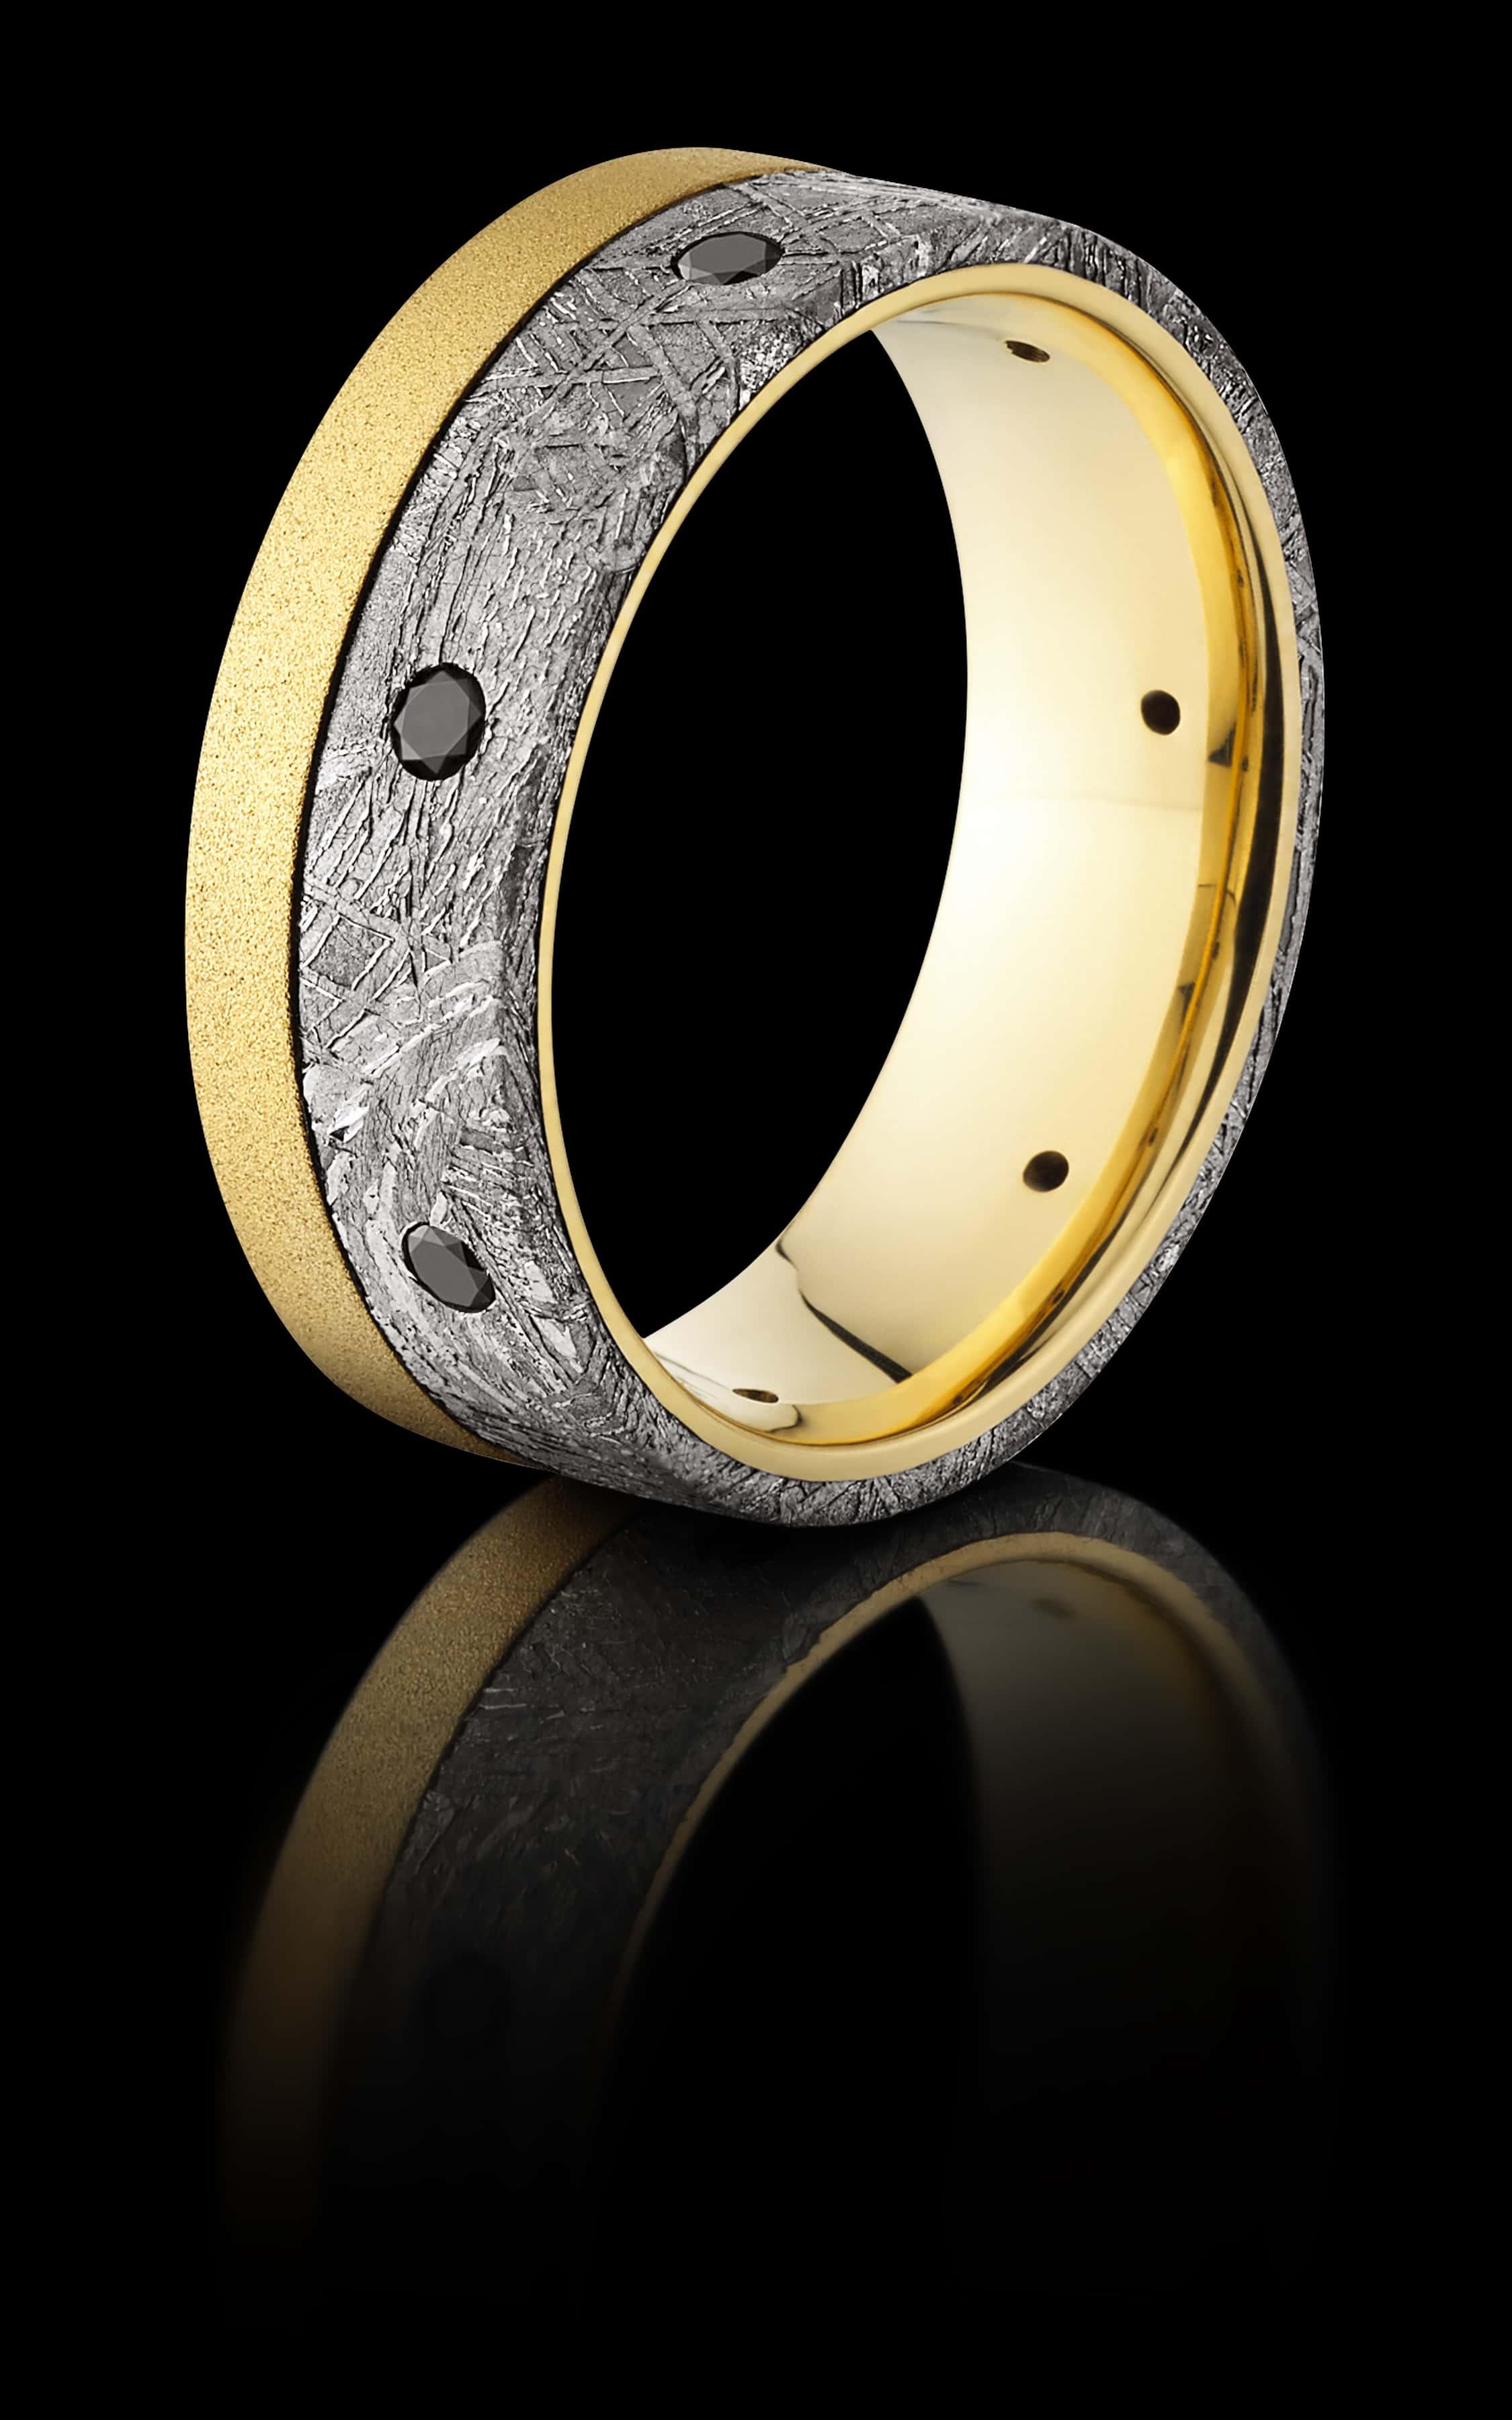 Lashbrook Gents Wedding Ring Custom Meteor JCK 2